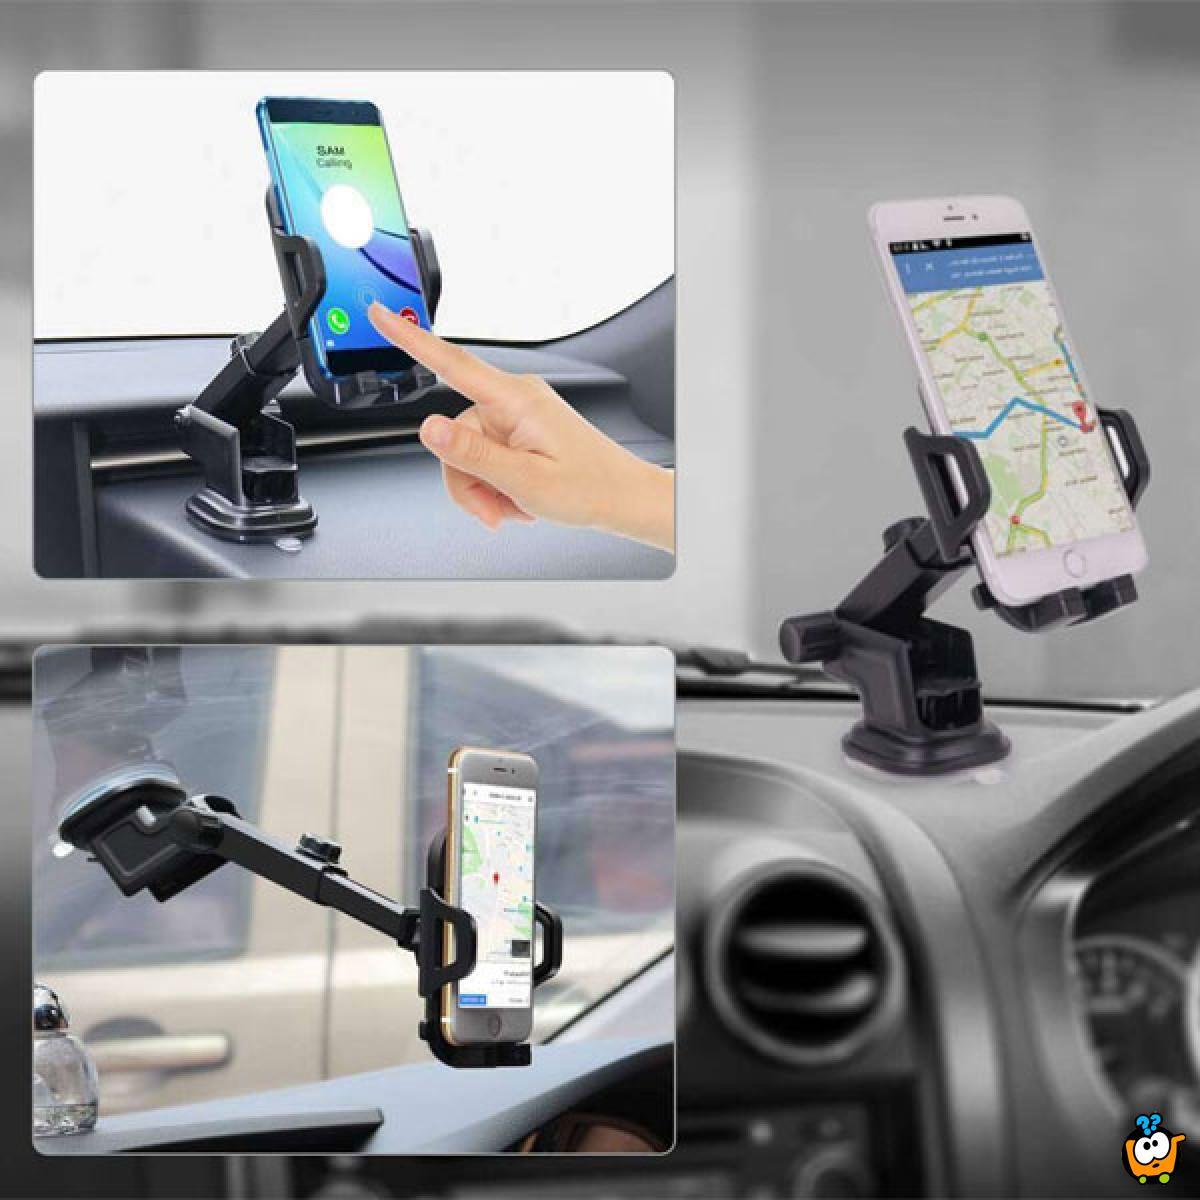 Classic holder - Stabilni držac telefona u automobilu